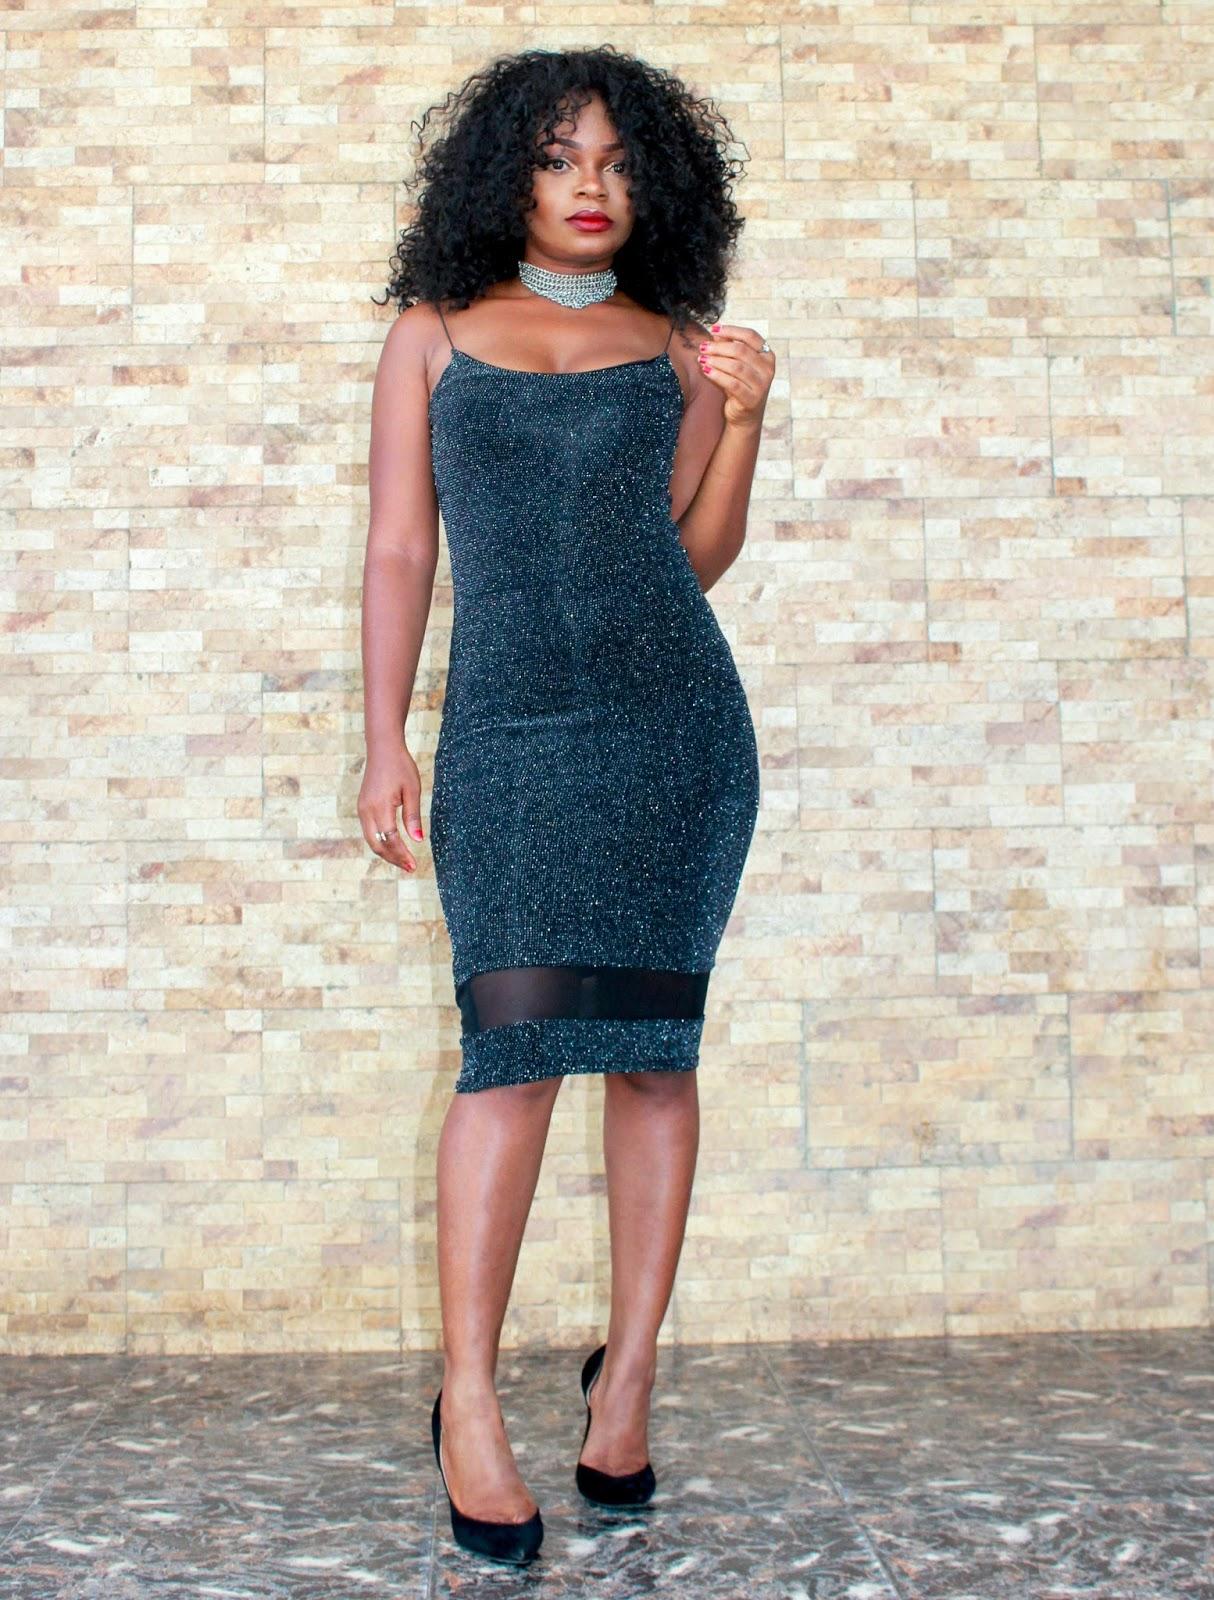 MissRebel Black shimmery dress with Boohoo Black Court shoes